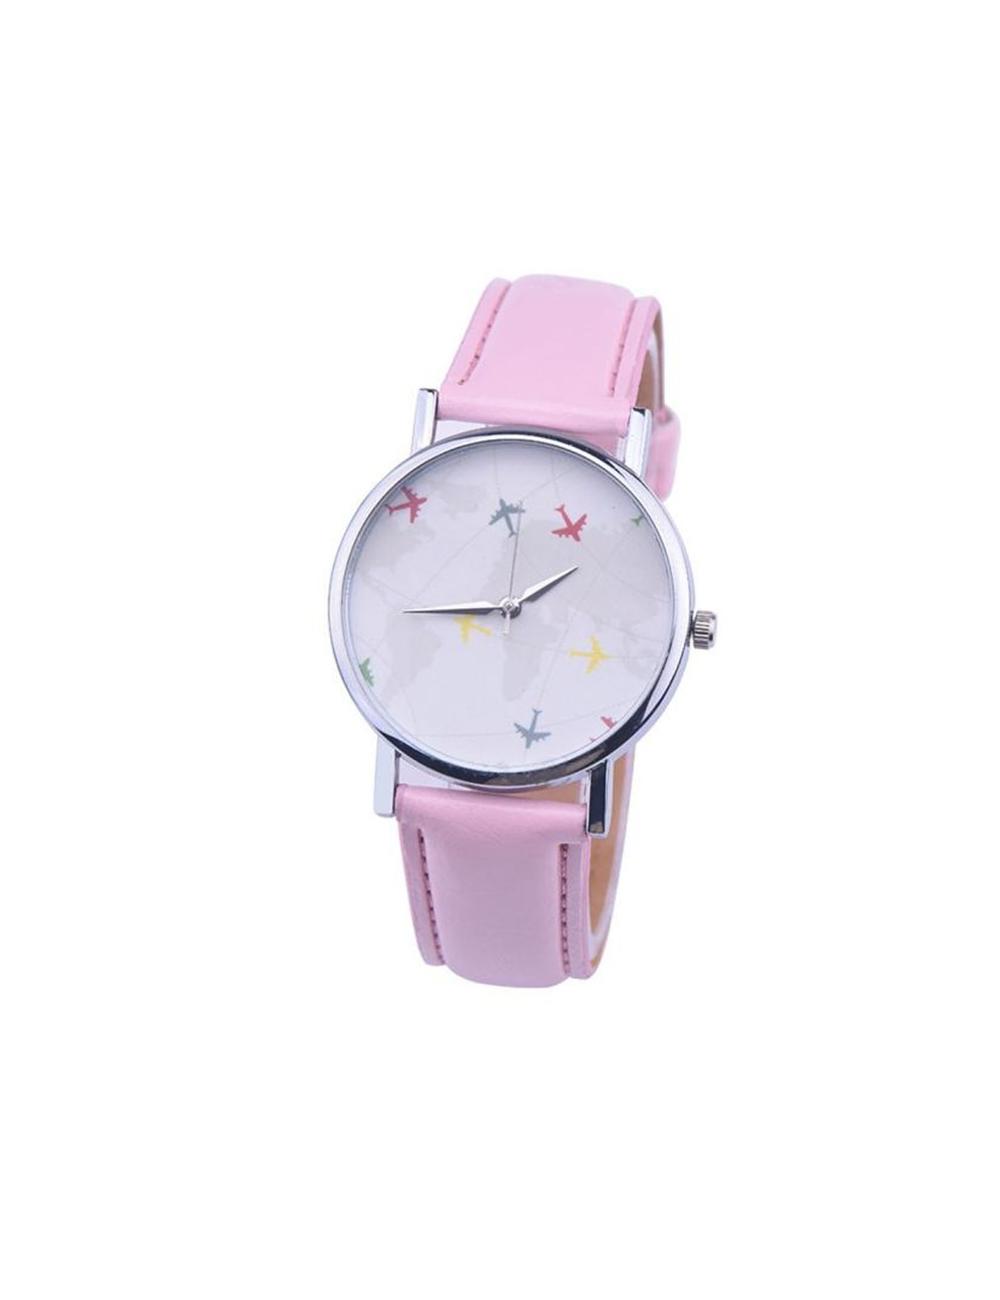 Reloj Rutas Aéreas Dayoshop 31,900.00